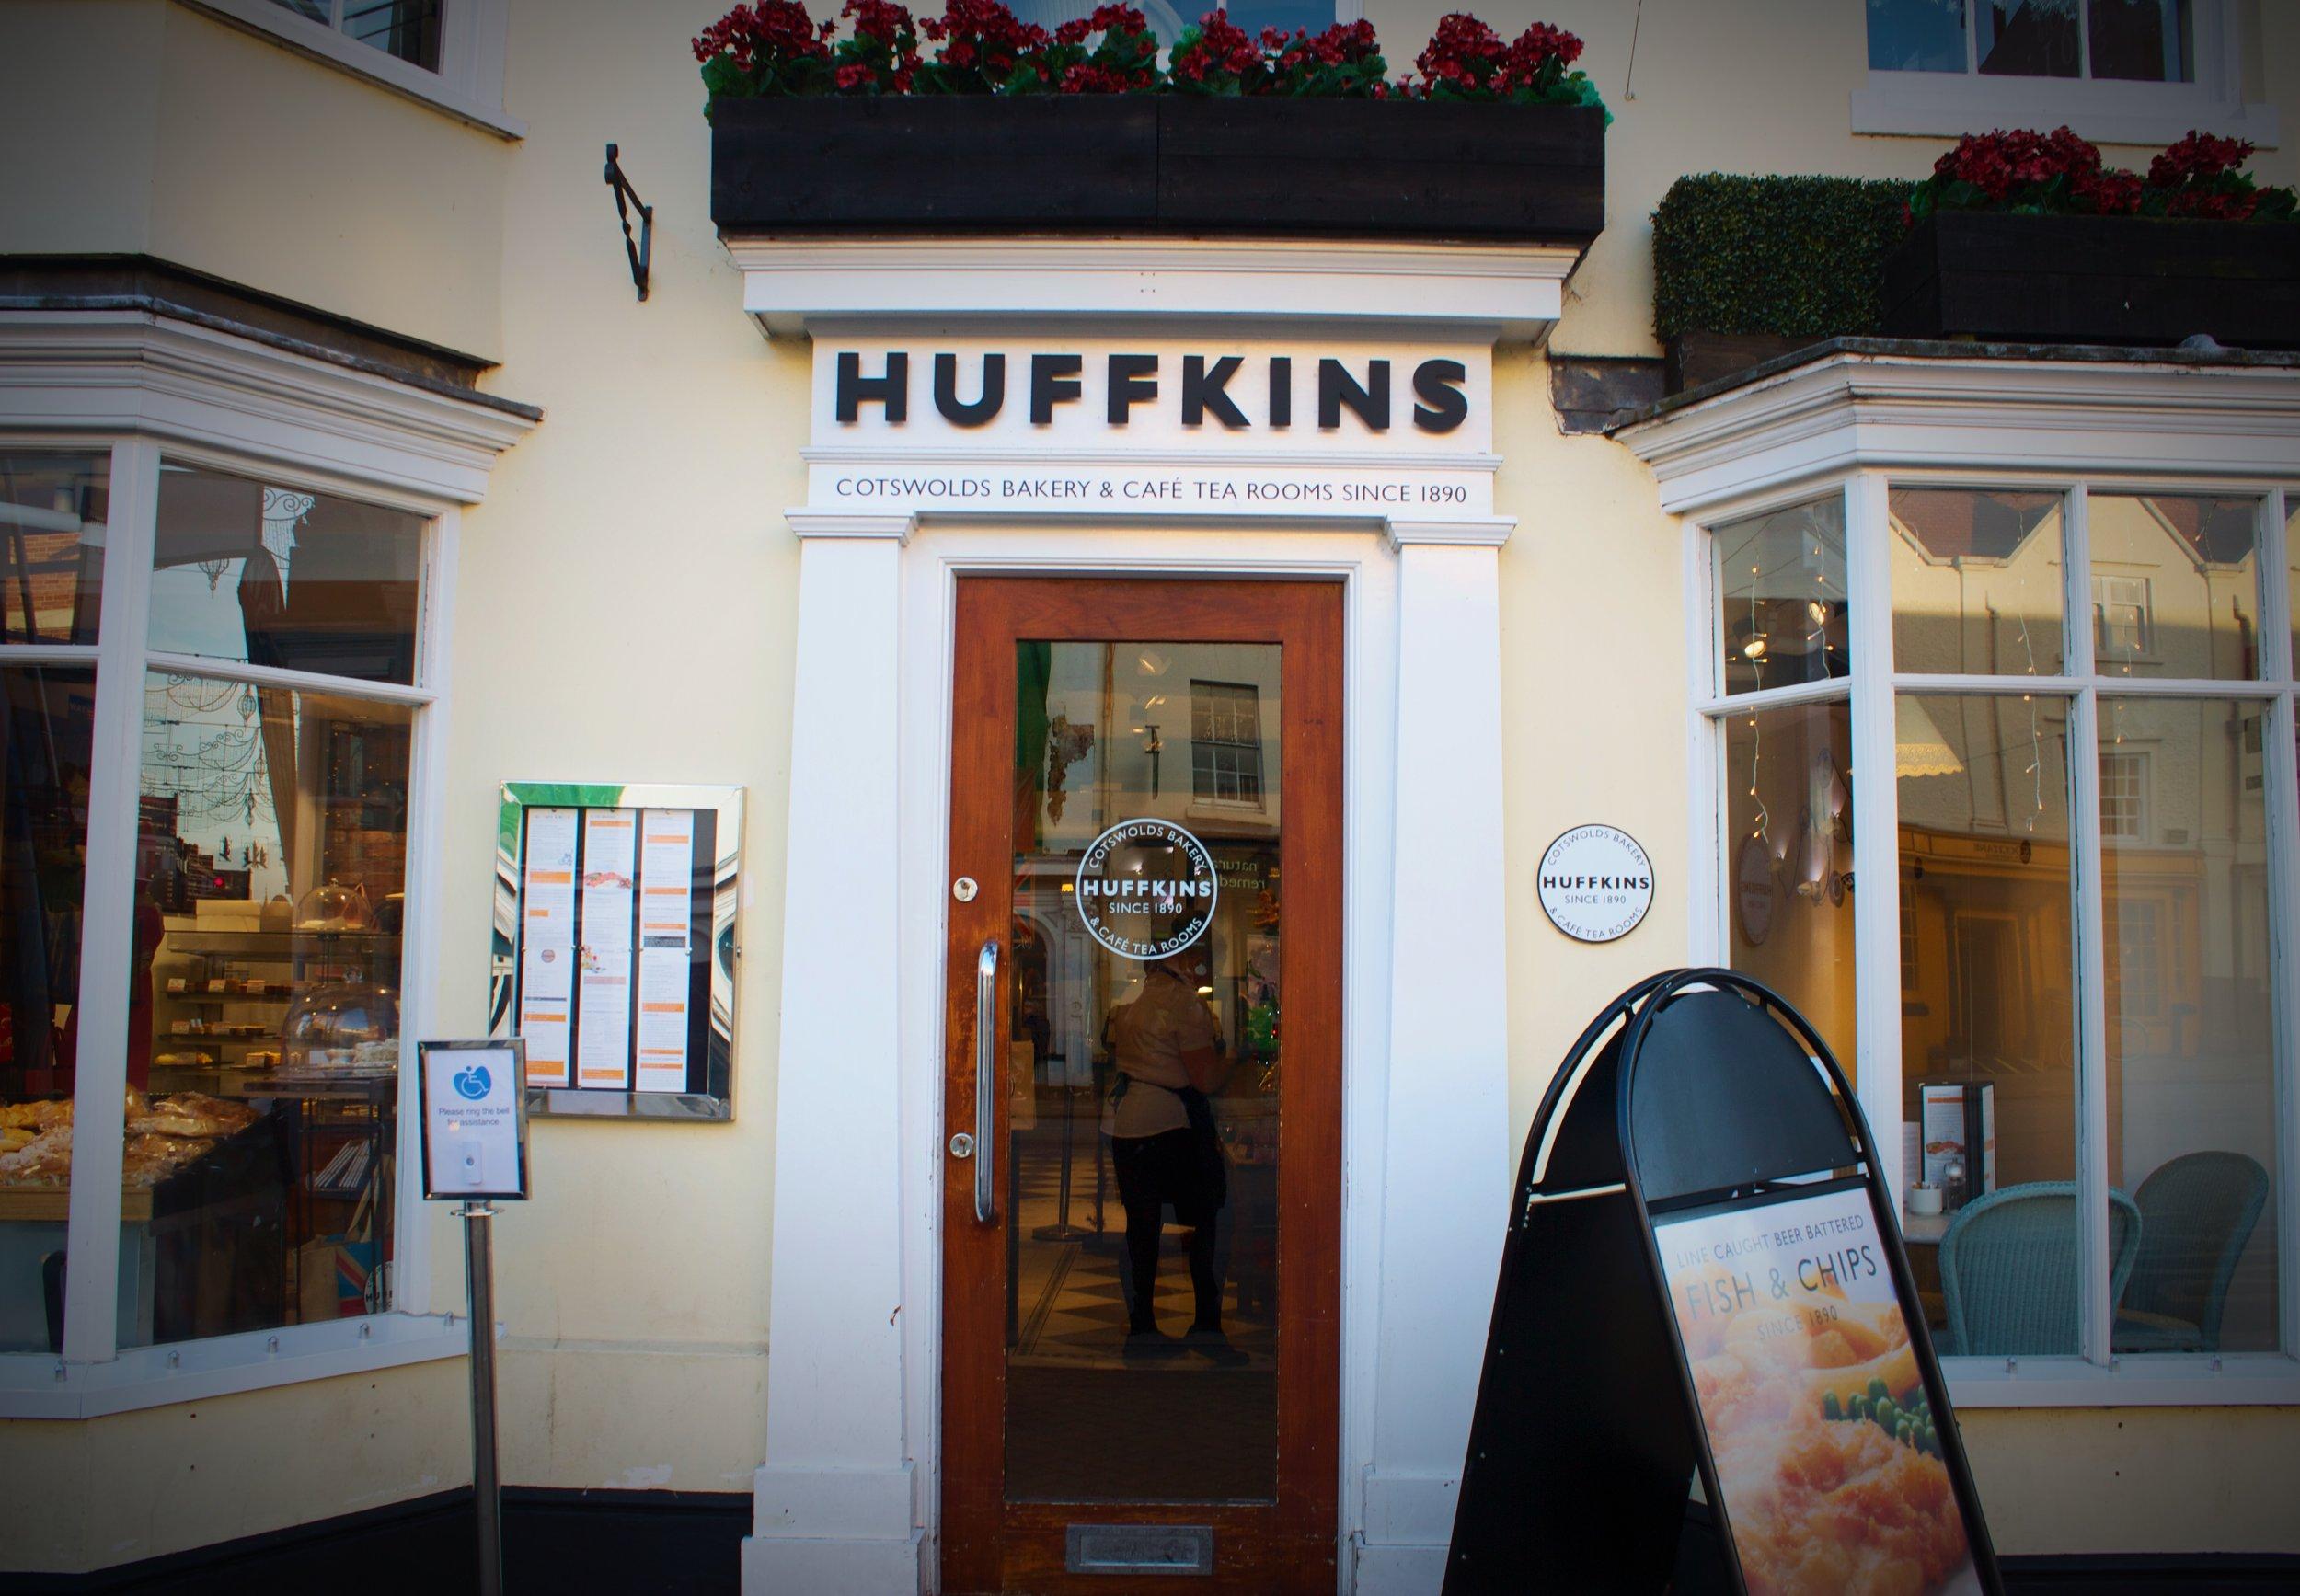 Huffkins Stratford upon avon Bakery & Cafe